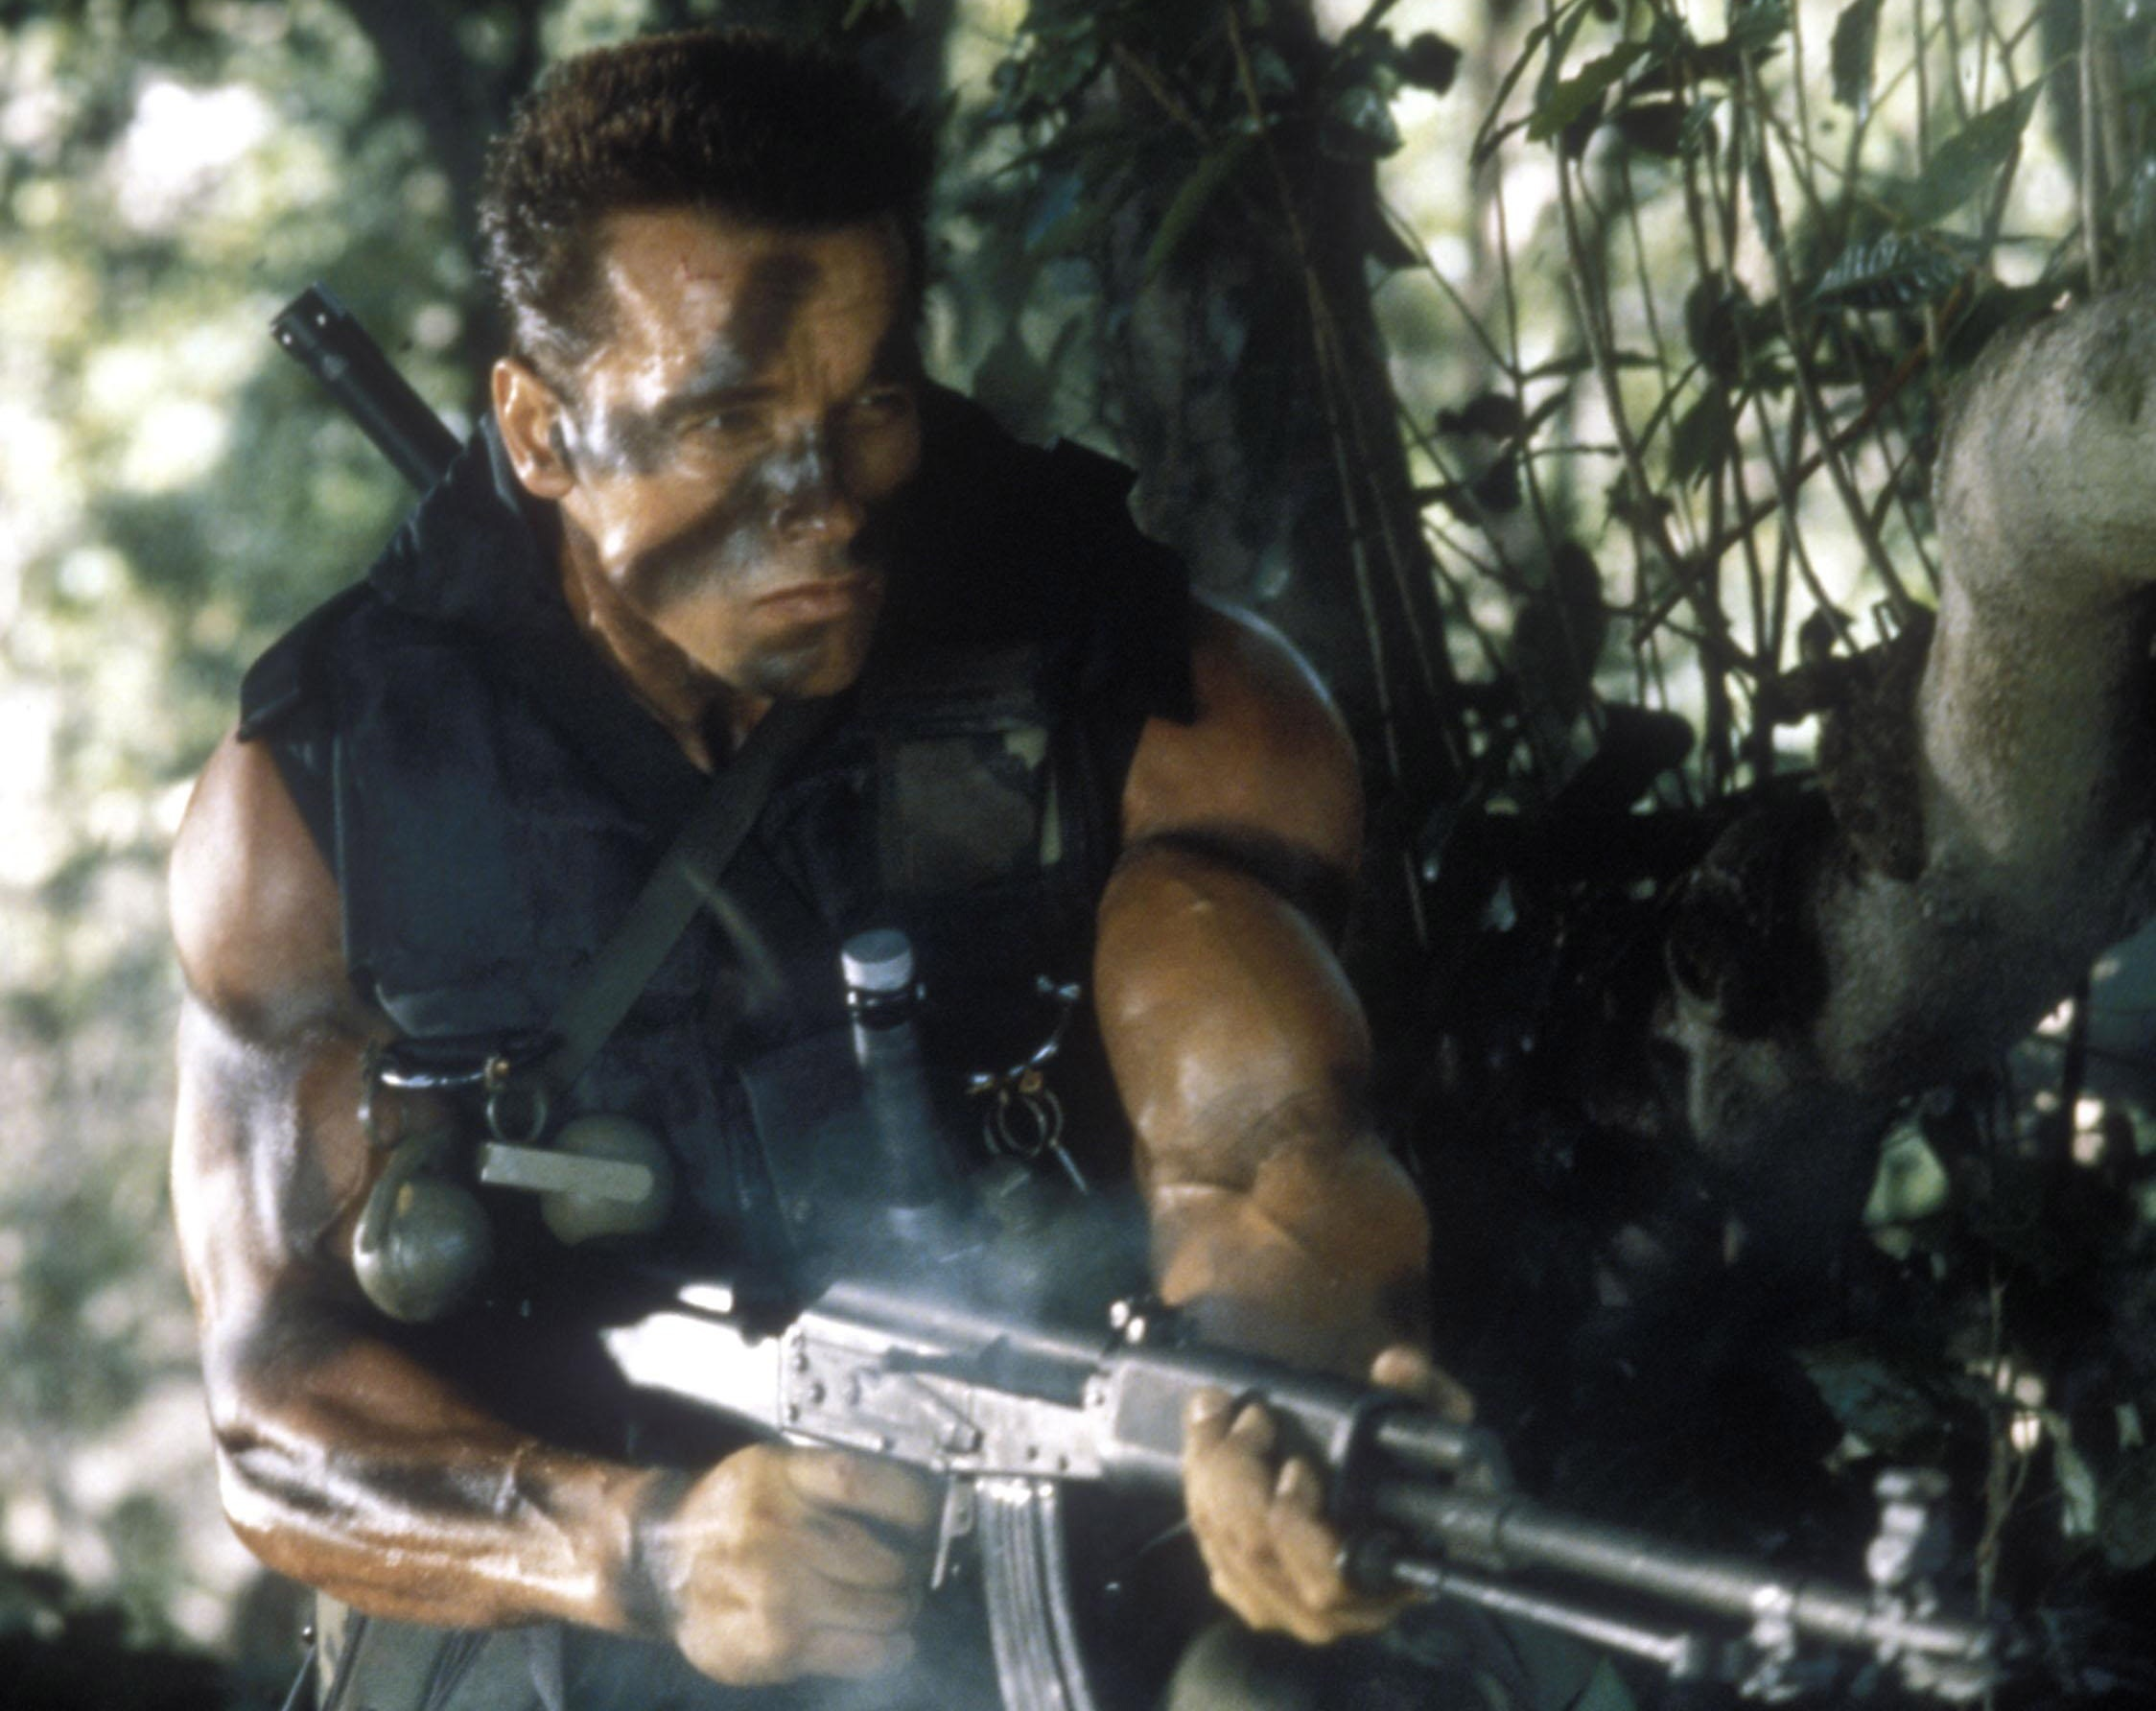 20593 download wallpaper Cinema, People, Actors, Men, Arnold Schwarzenegger screensavers and pictures for free